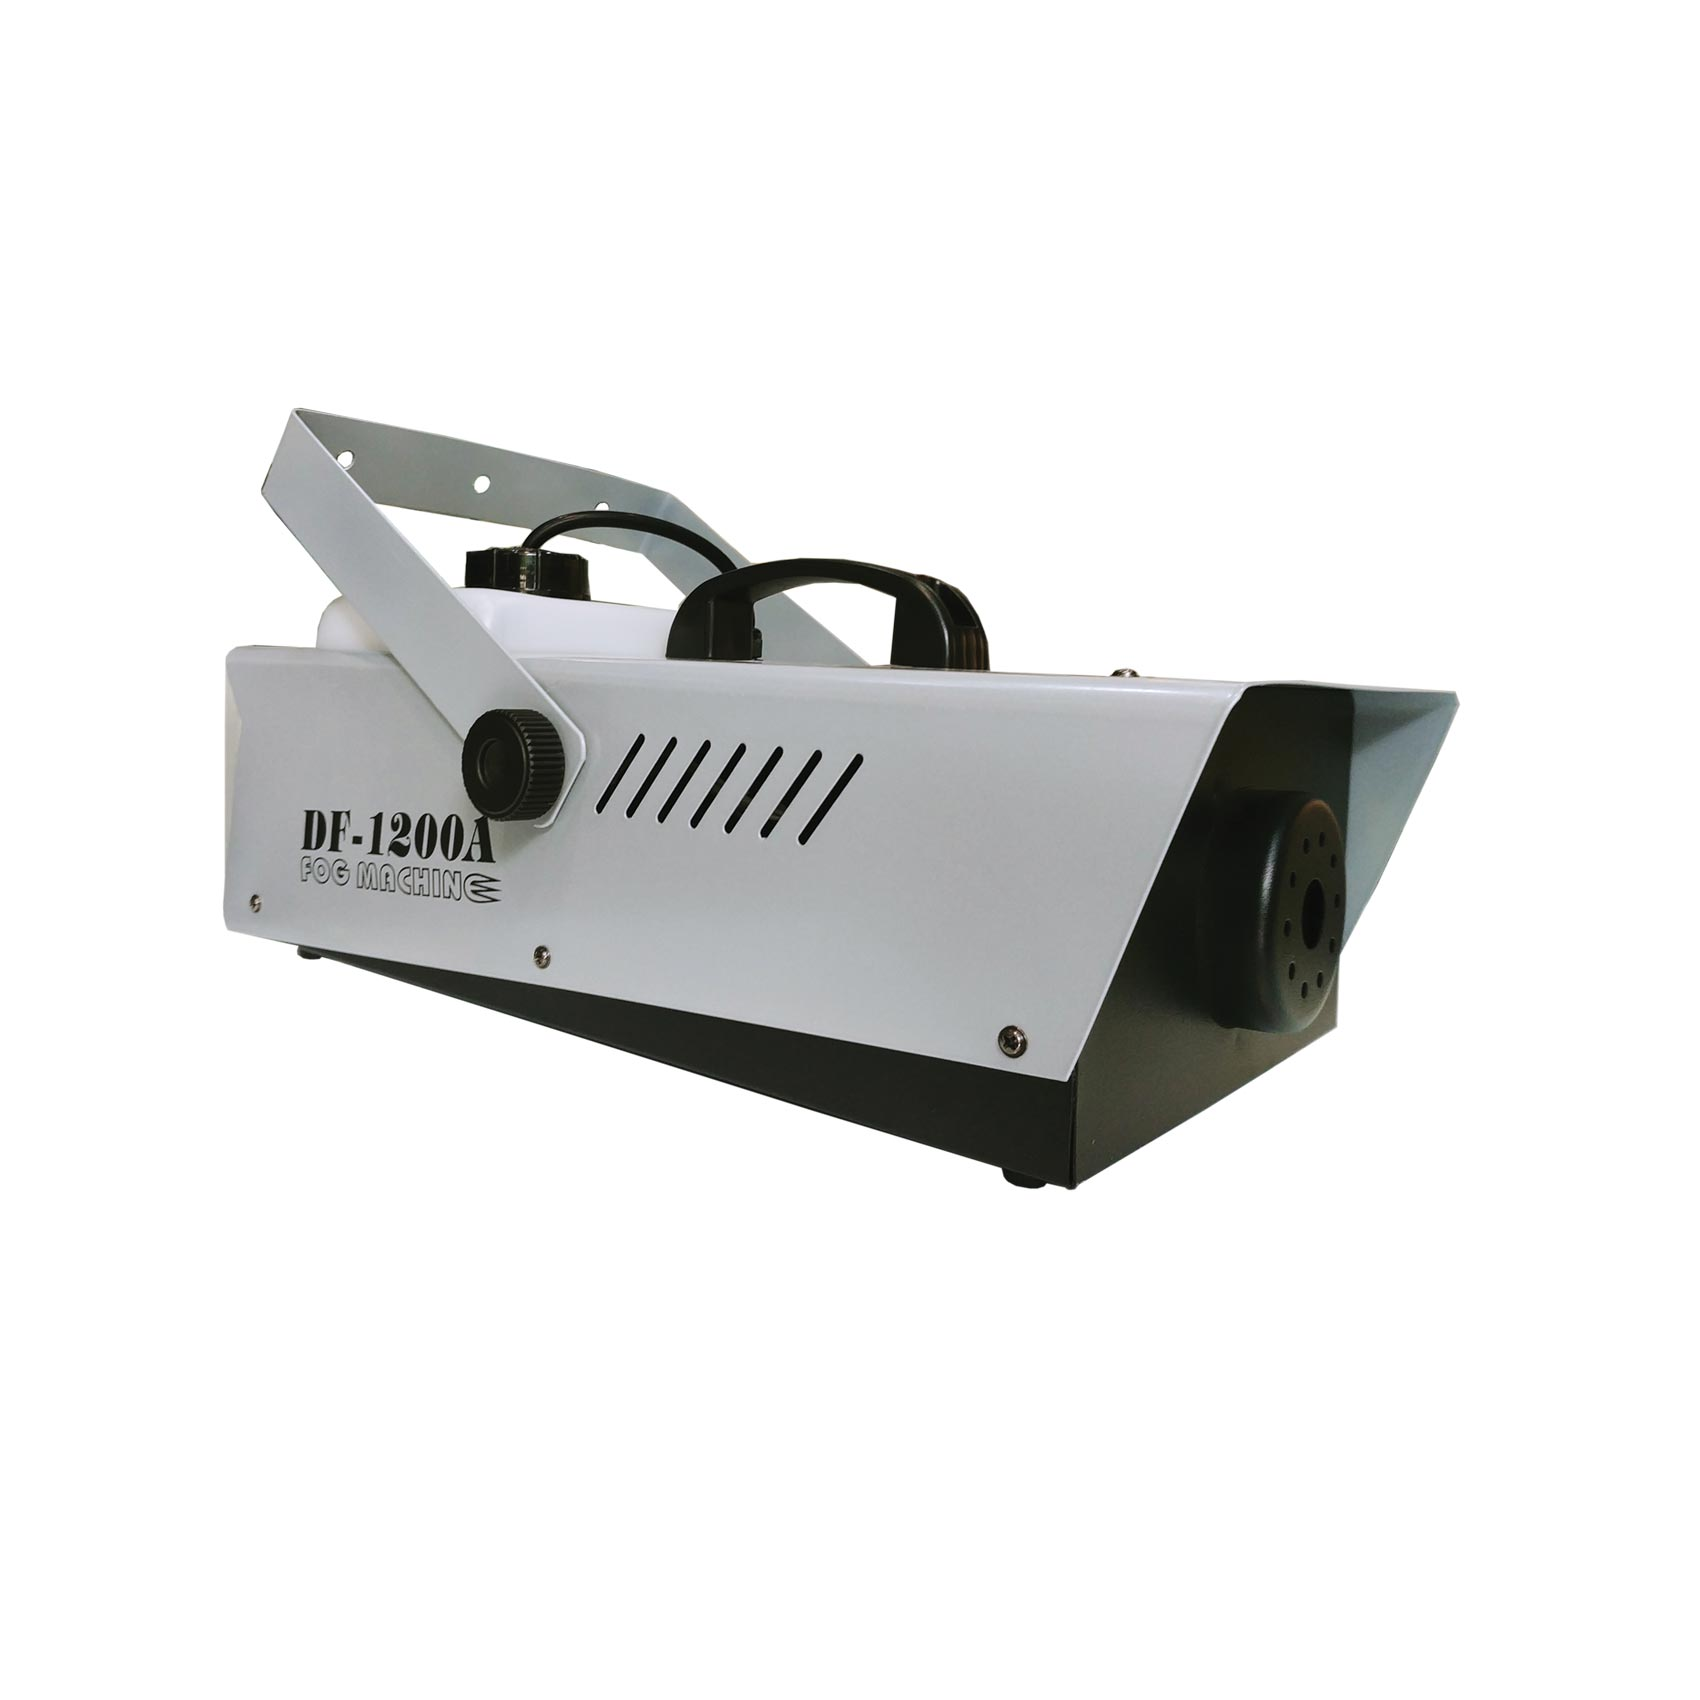 df-1200-2